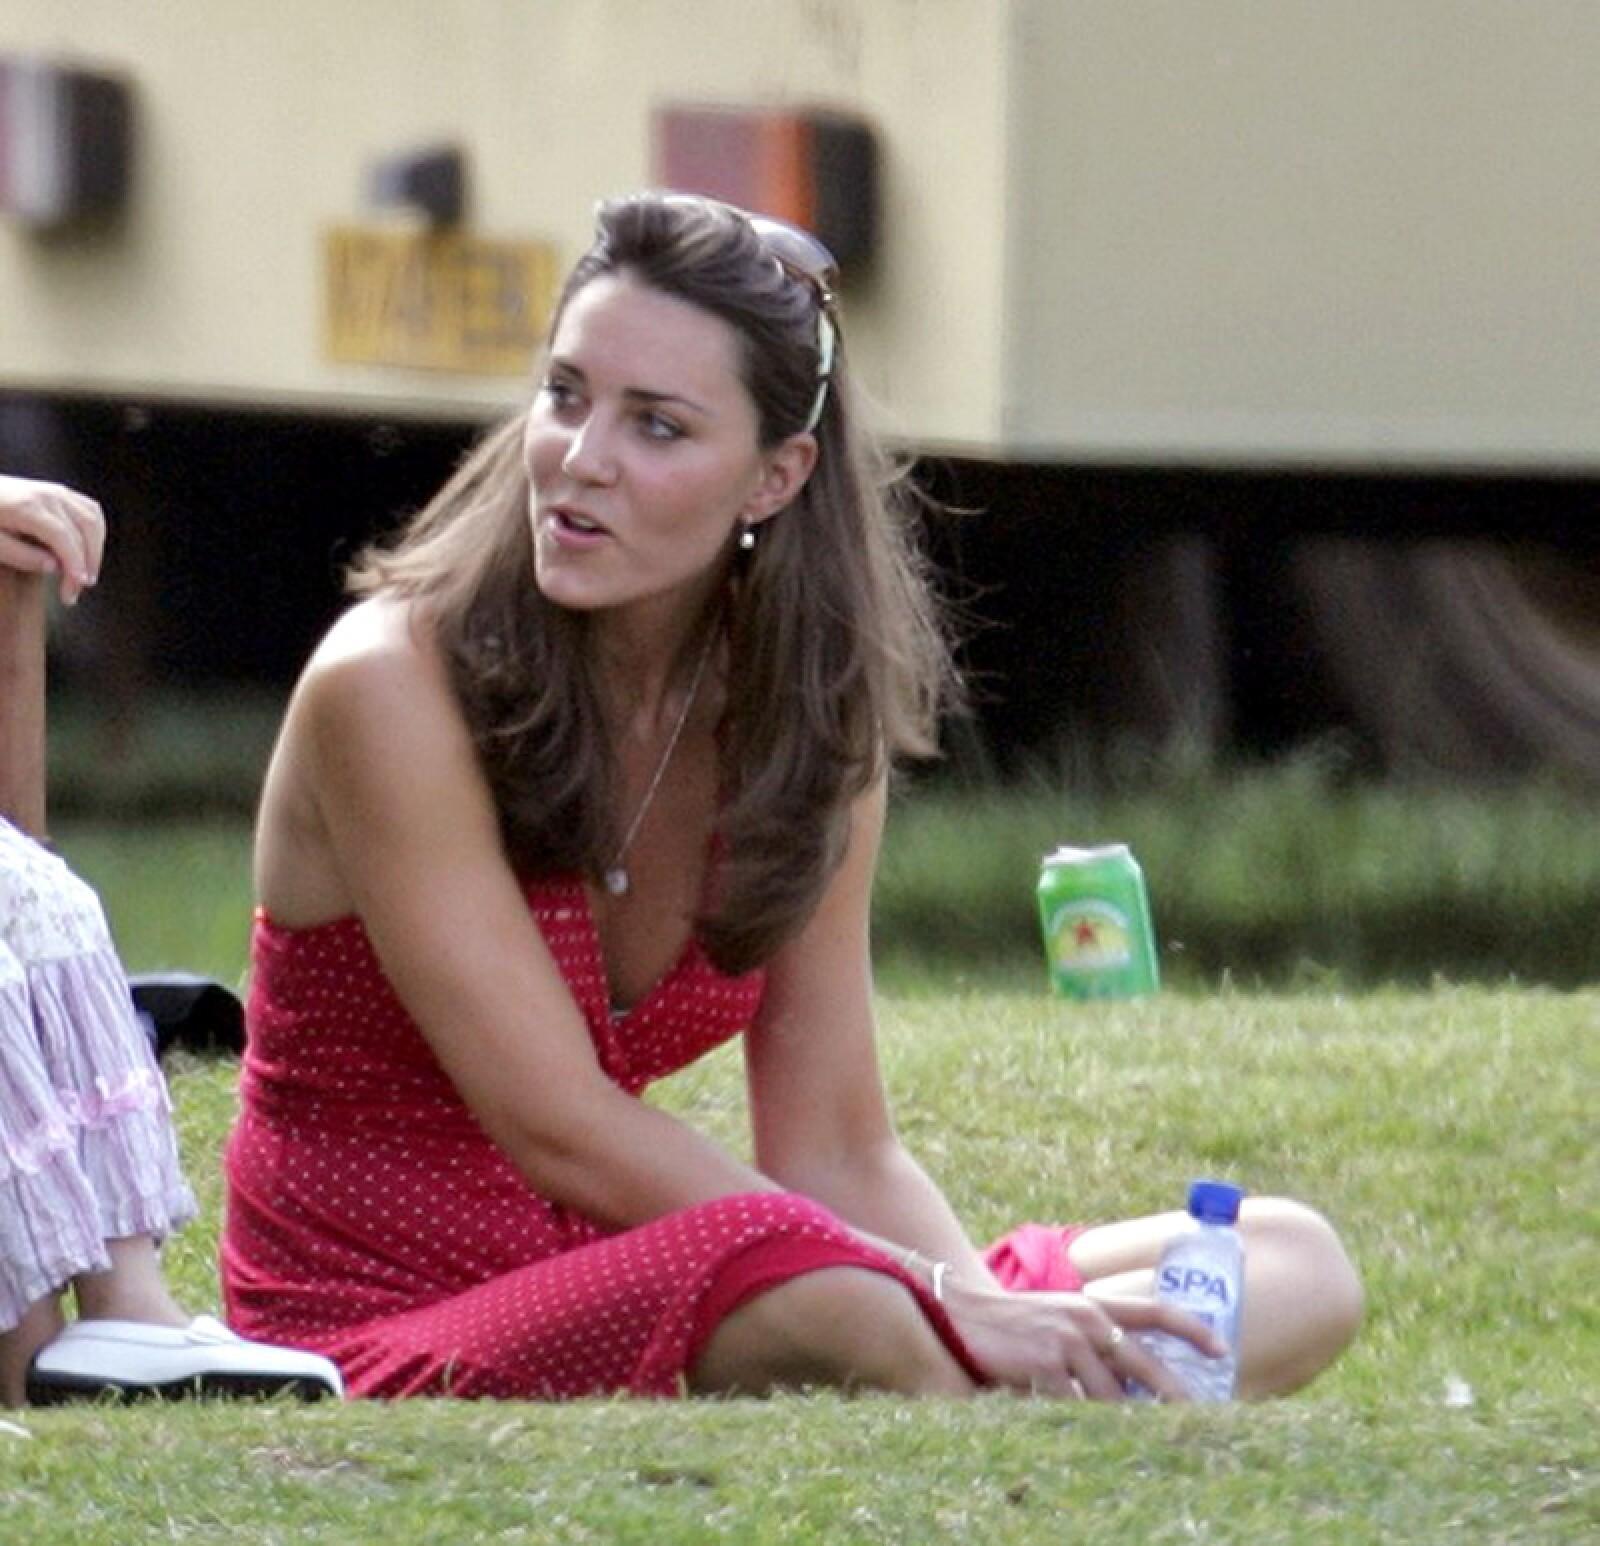 Prince William and Kate Middleton at the Chakravarty Polo Match, Ham Polo Club, Richmond, Surrey, Britain - 17 Jun 2006